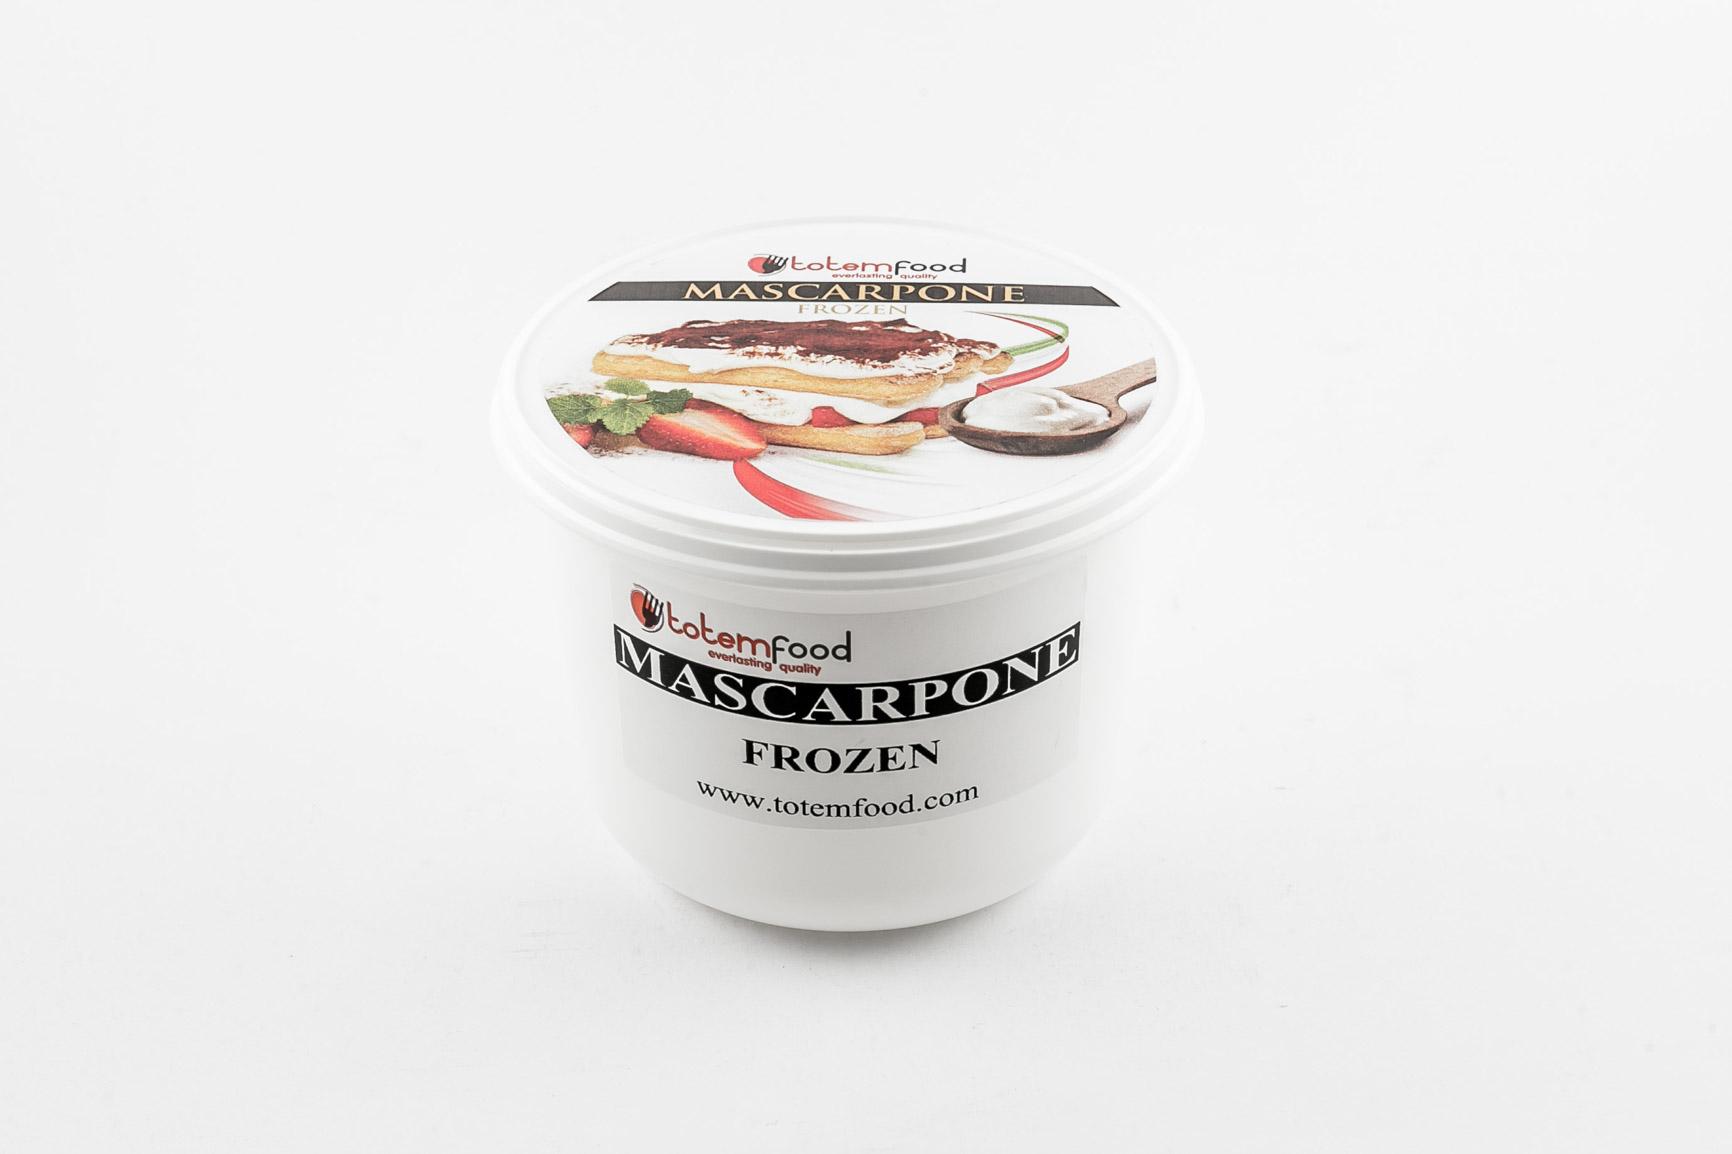 mascarpone frozen